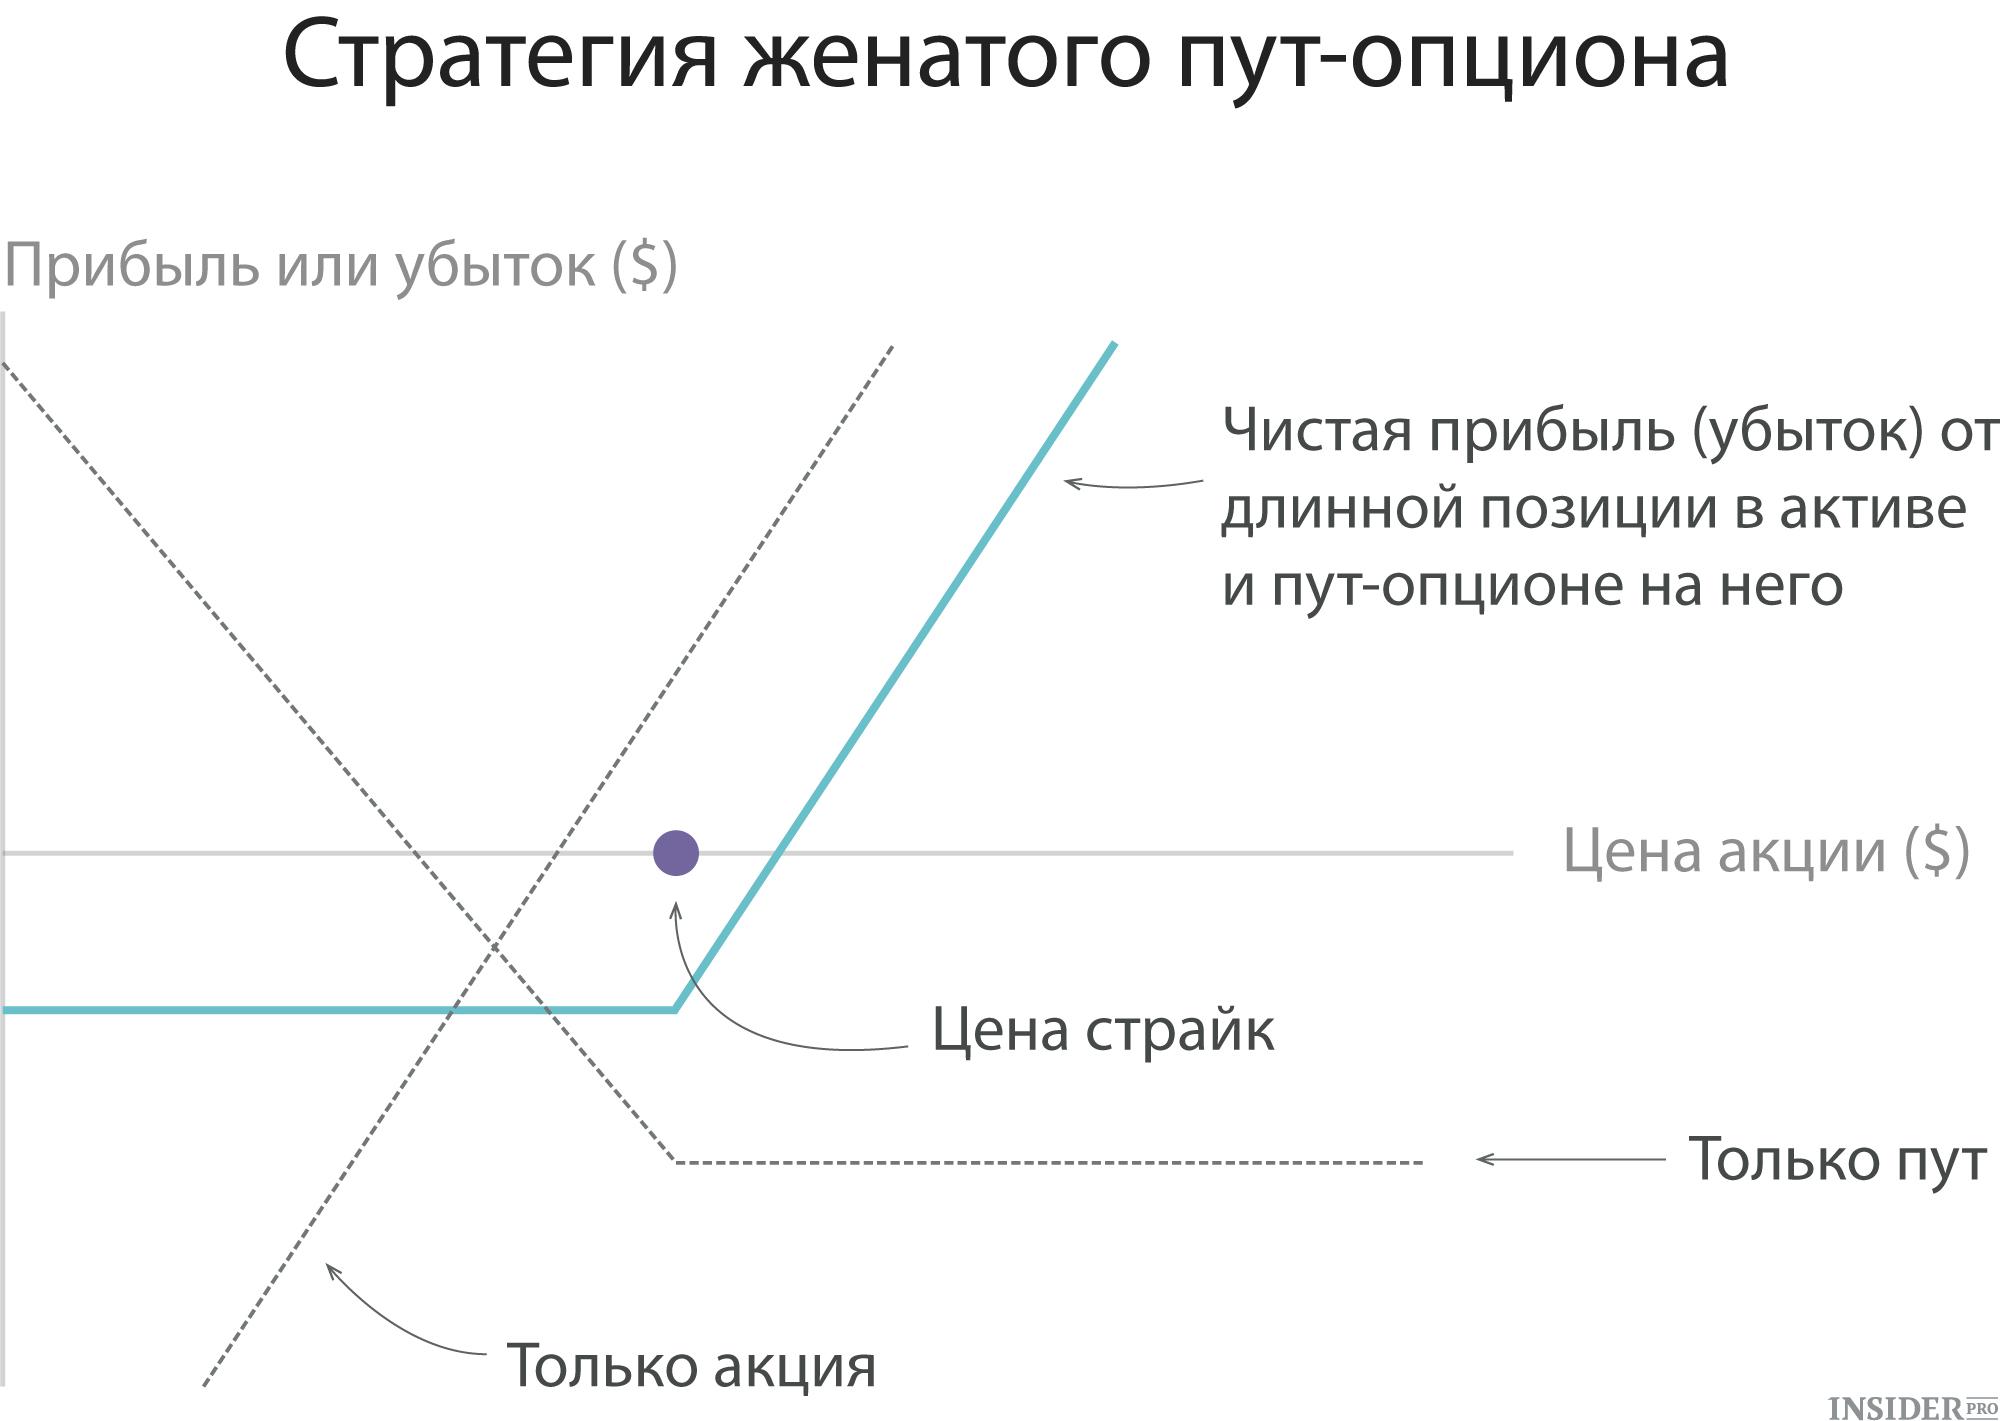 akciju opciju stratēģijas)